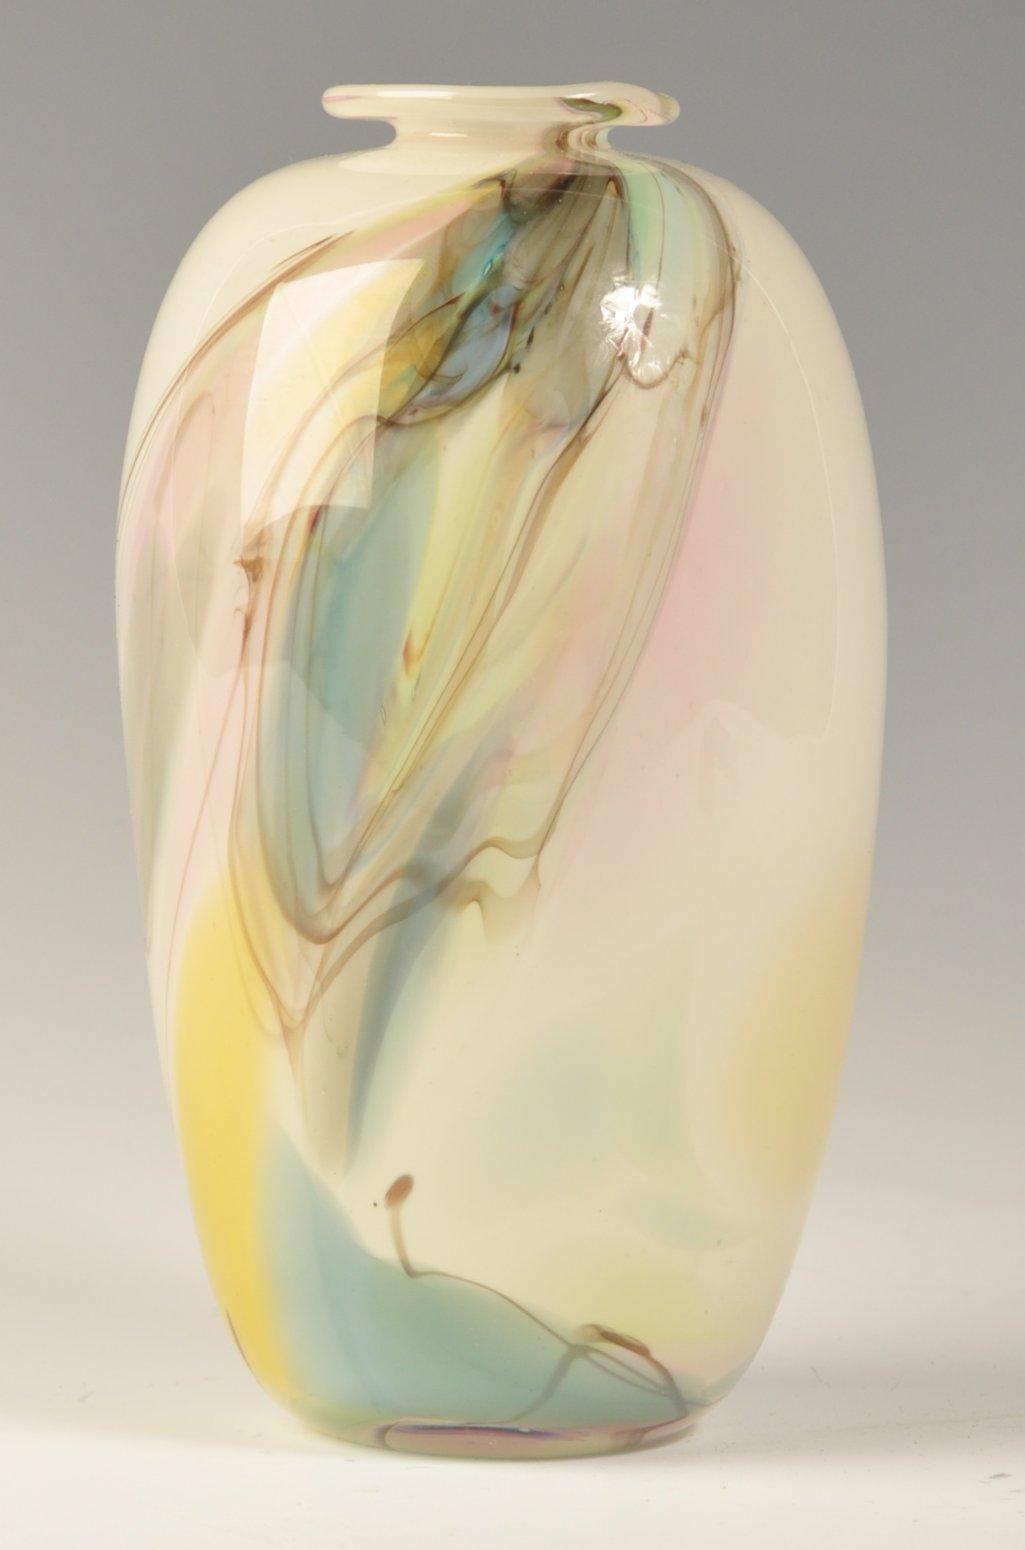 Lot 16 - WILLIAM WALKER RETRO VINTAGE STUDIO ART GLASS VASE